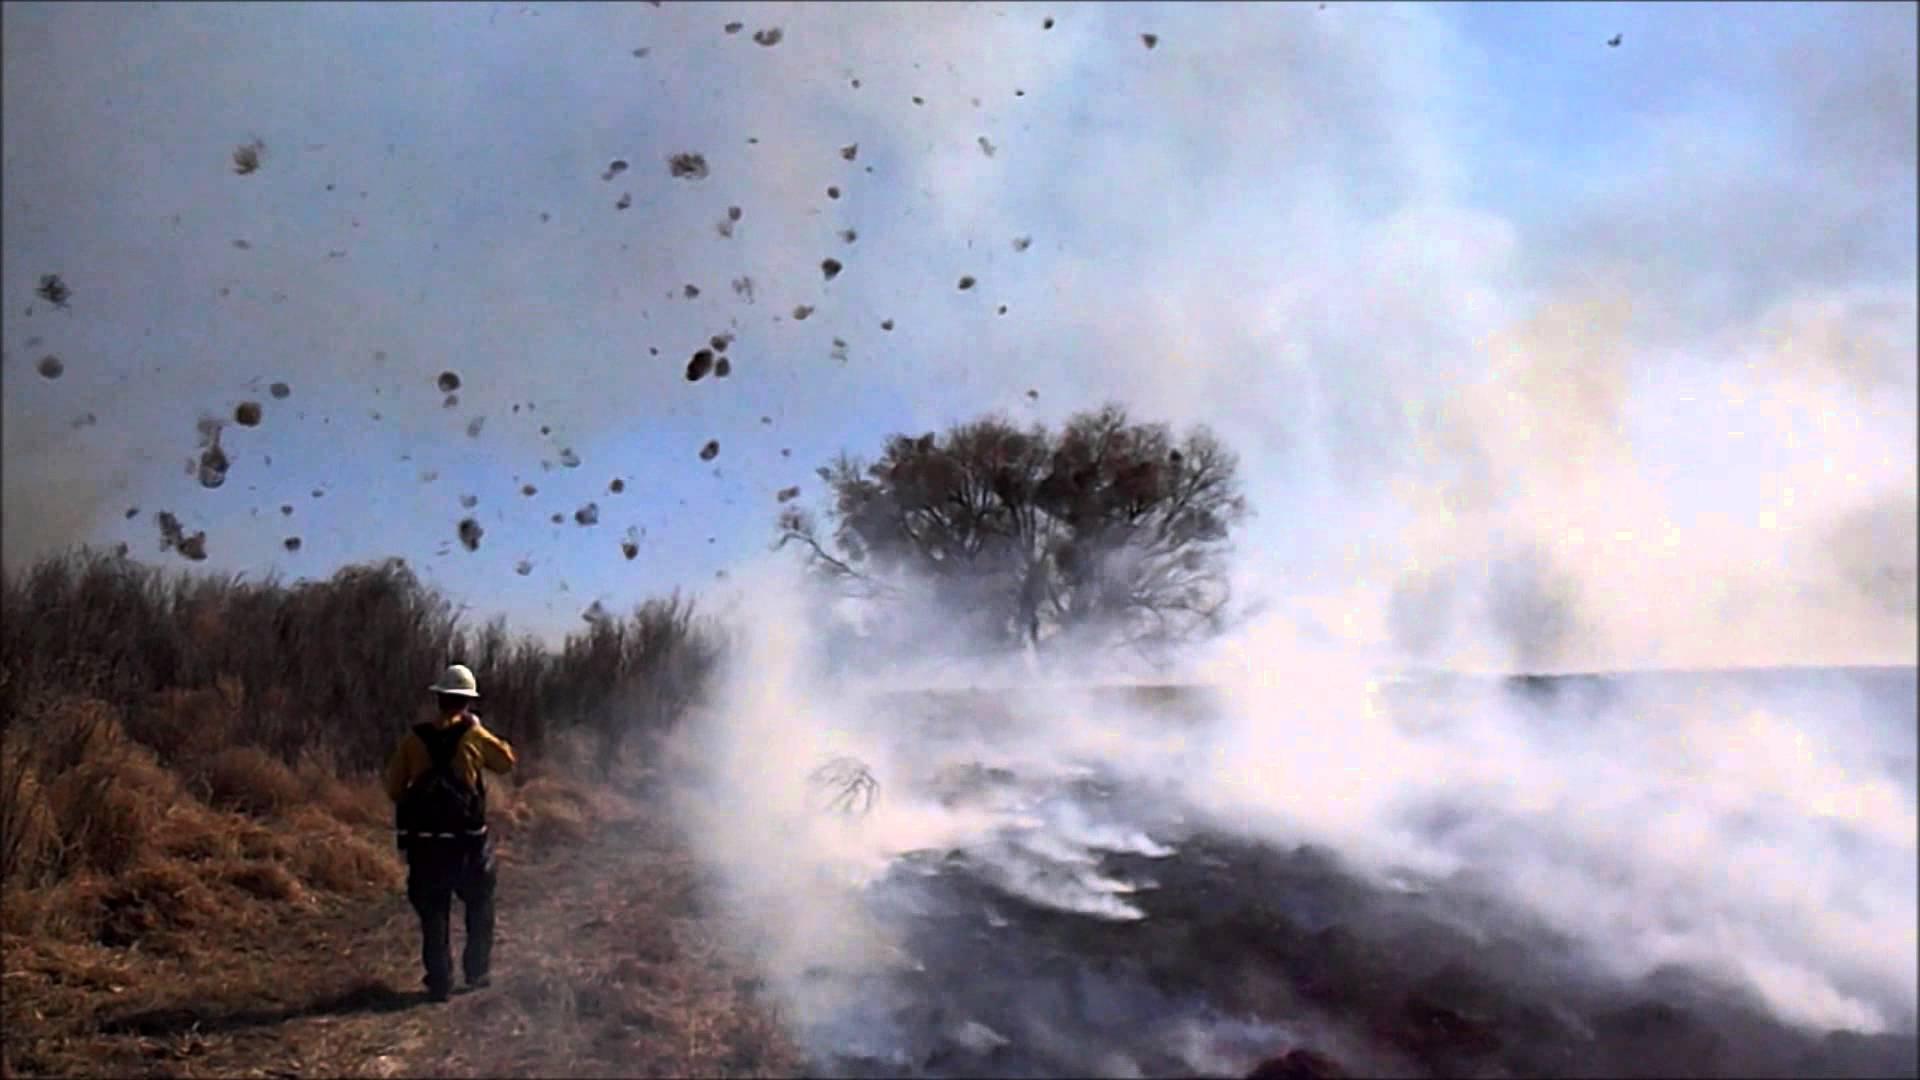 Une tornade de feu et de tumbleweeds